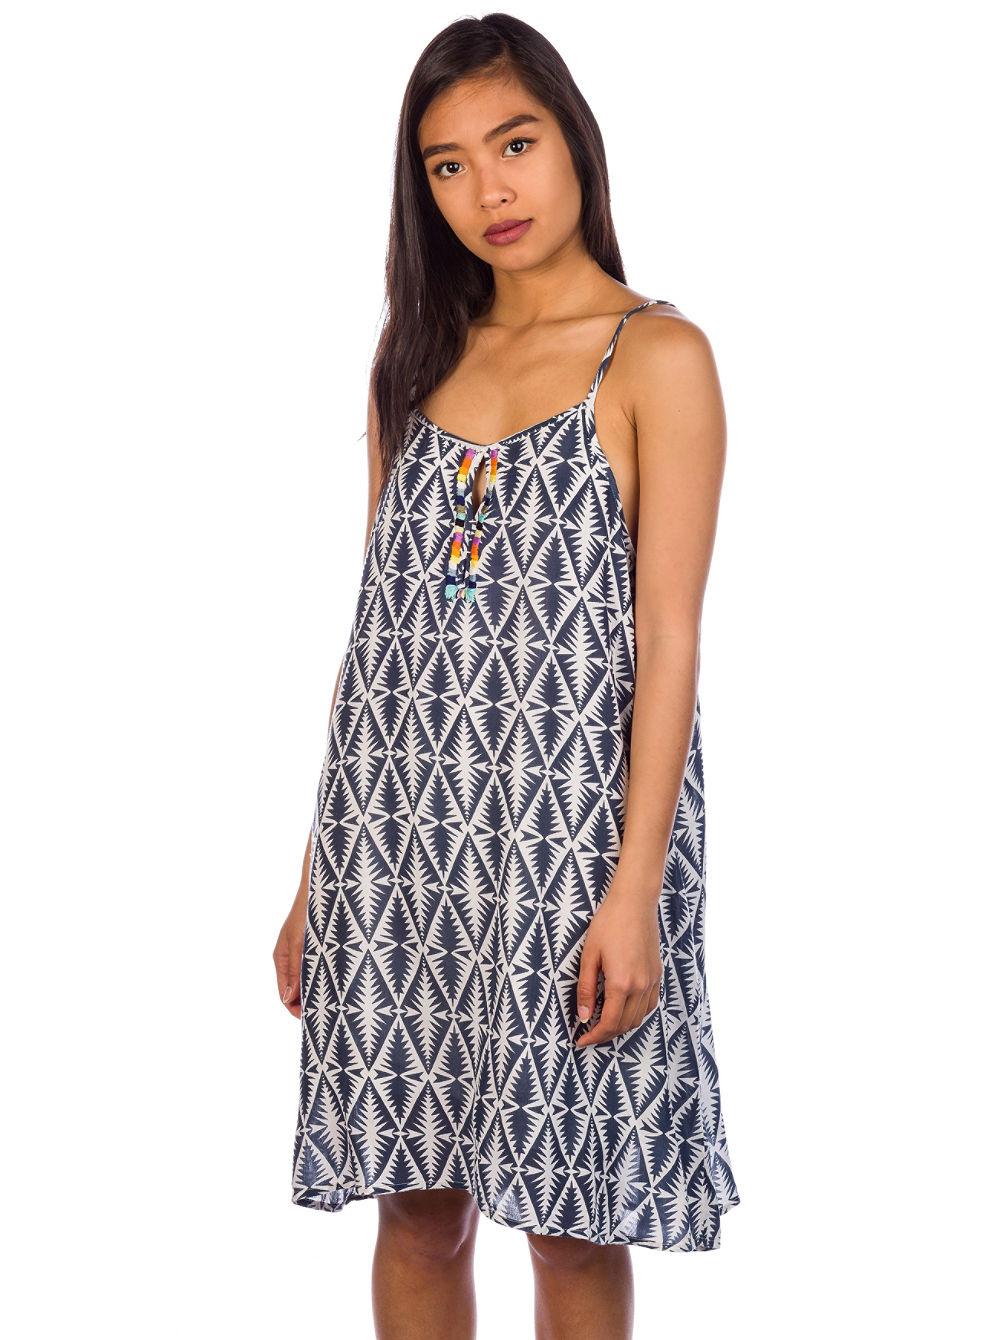 370fc0a845d Köp Rip Curl Beach Bazaar Cover-Up Klänning online på Blue Tomato